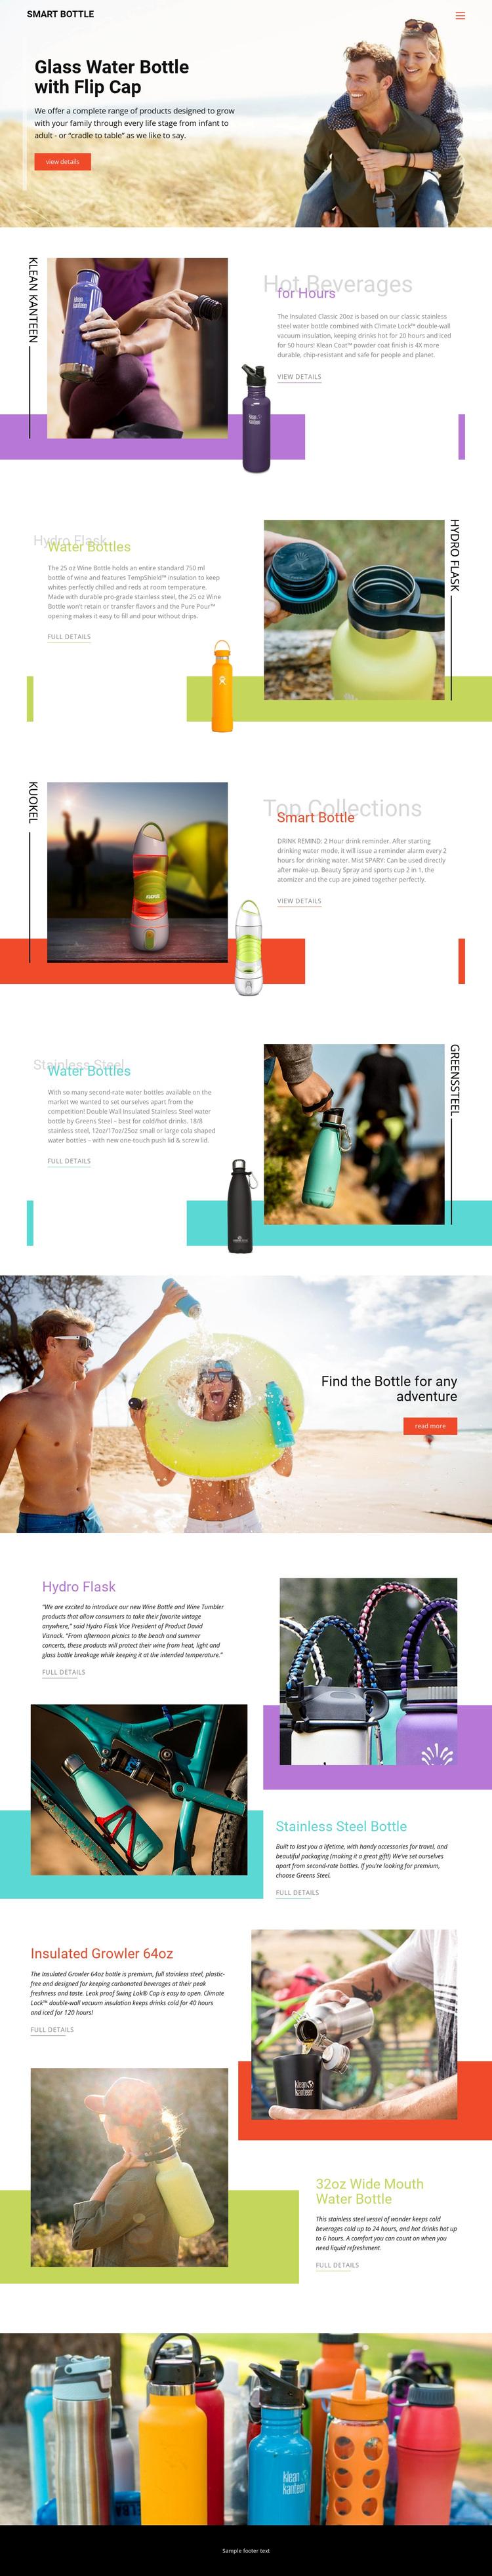 Water Bottles Joomla Page Builder